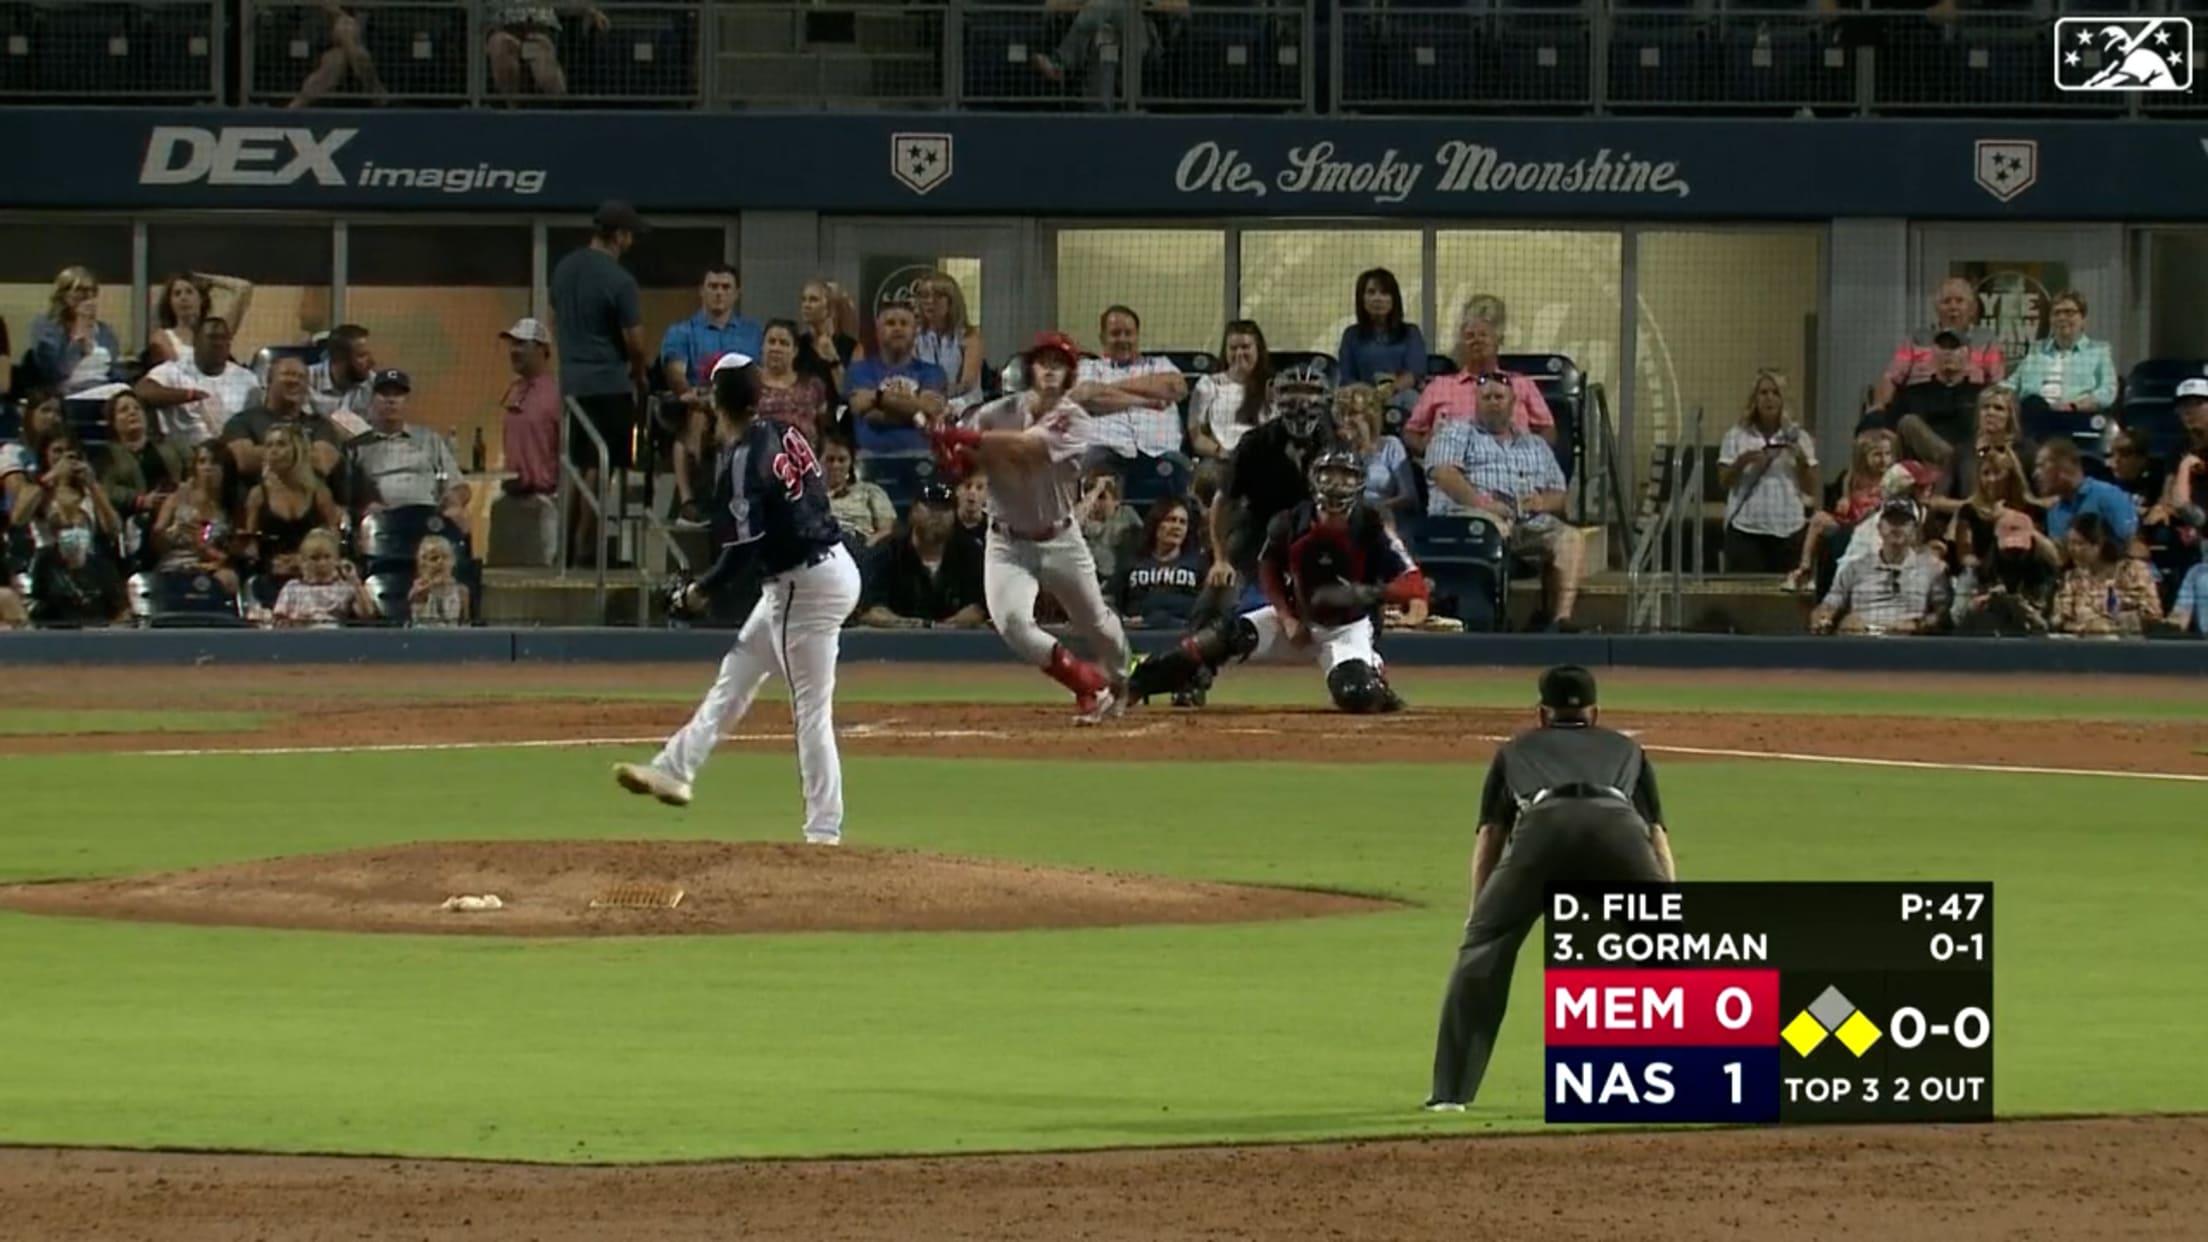 Gorman drills go-ahead homer